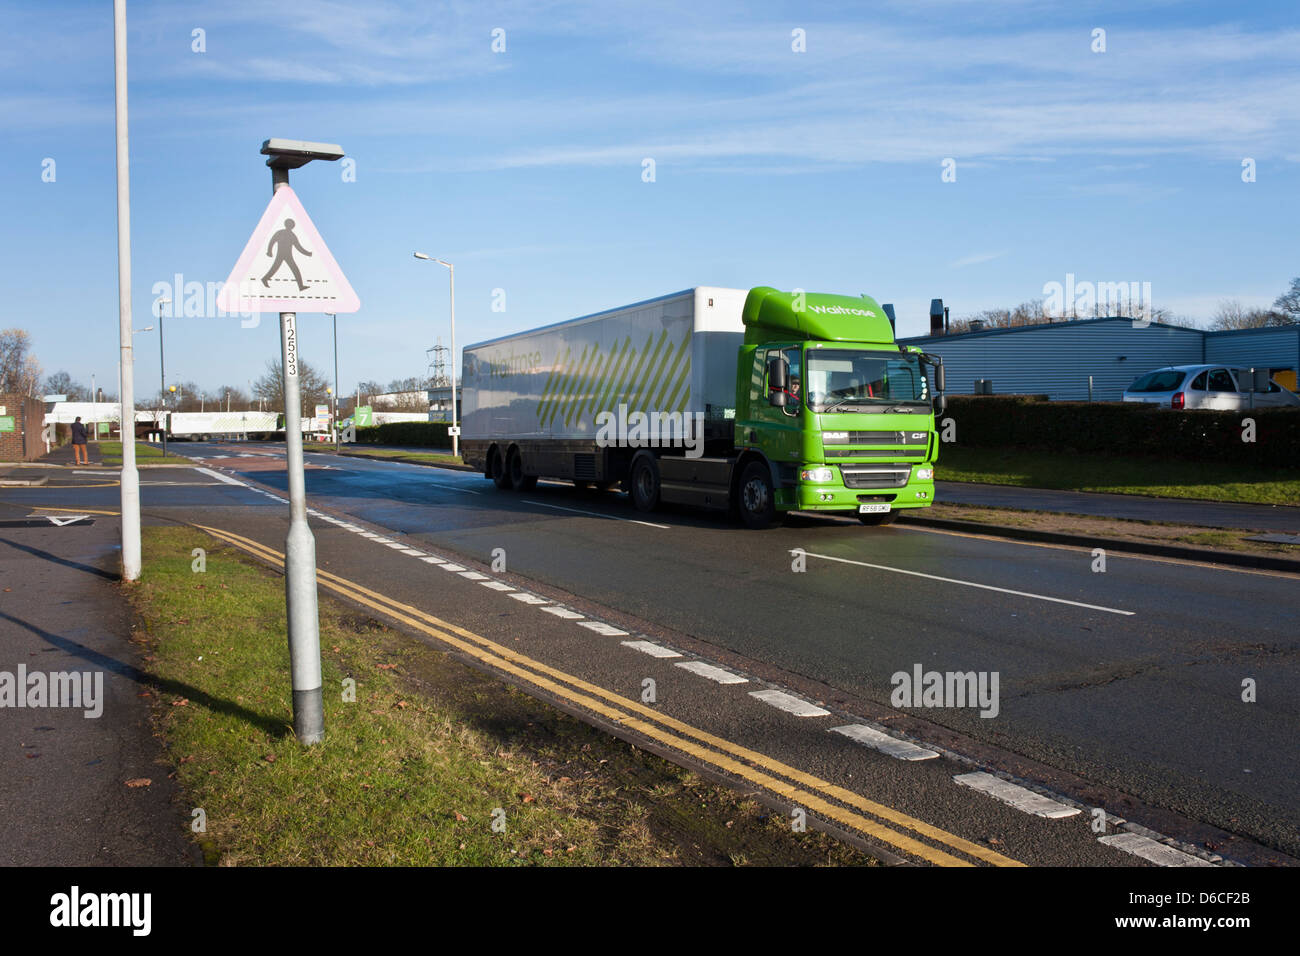 Waitrose supermarket HGV food truck on the road. Bracknell, Berkshire, England, GB, UK - Stock Image